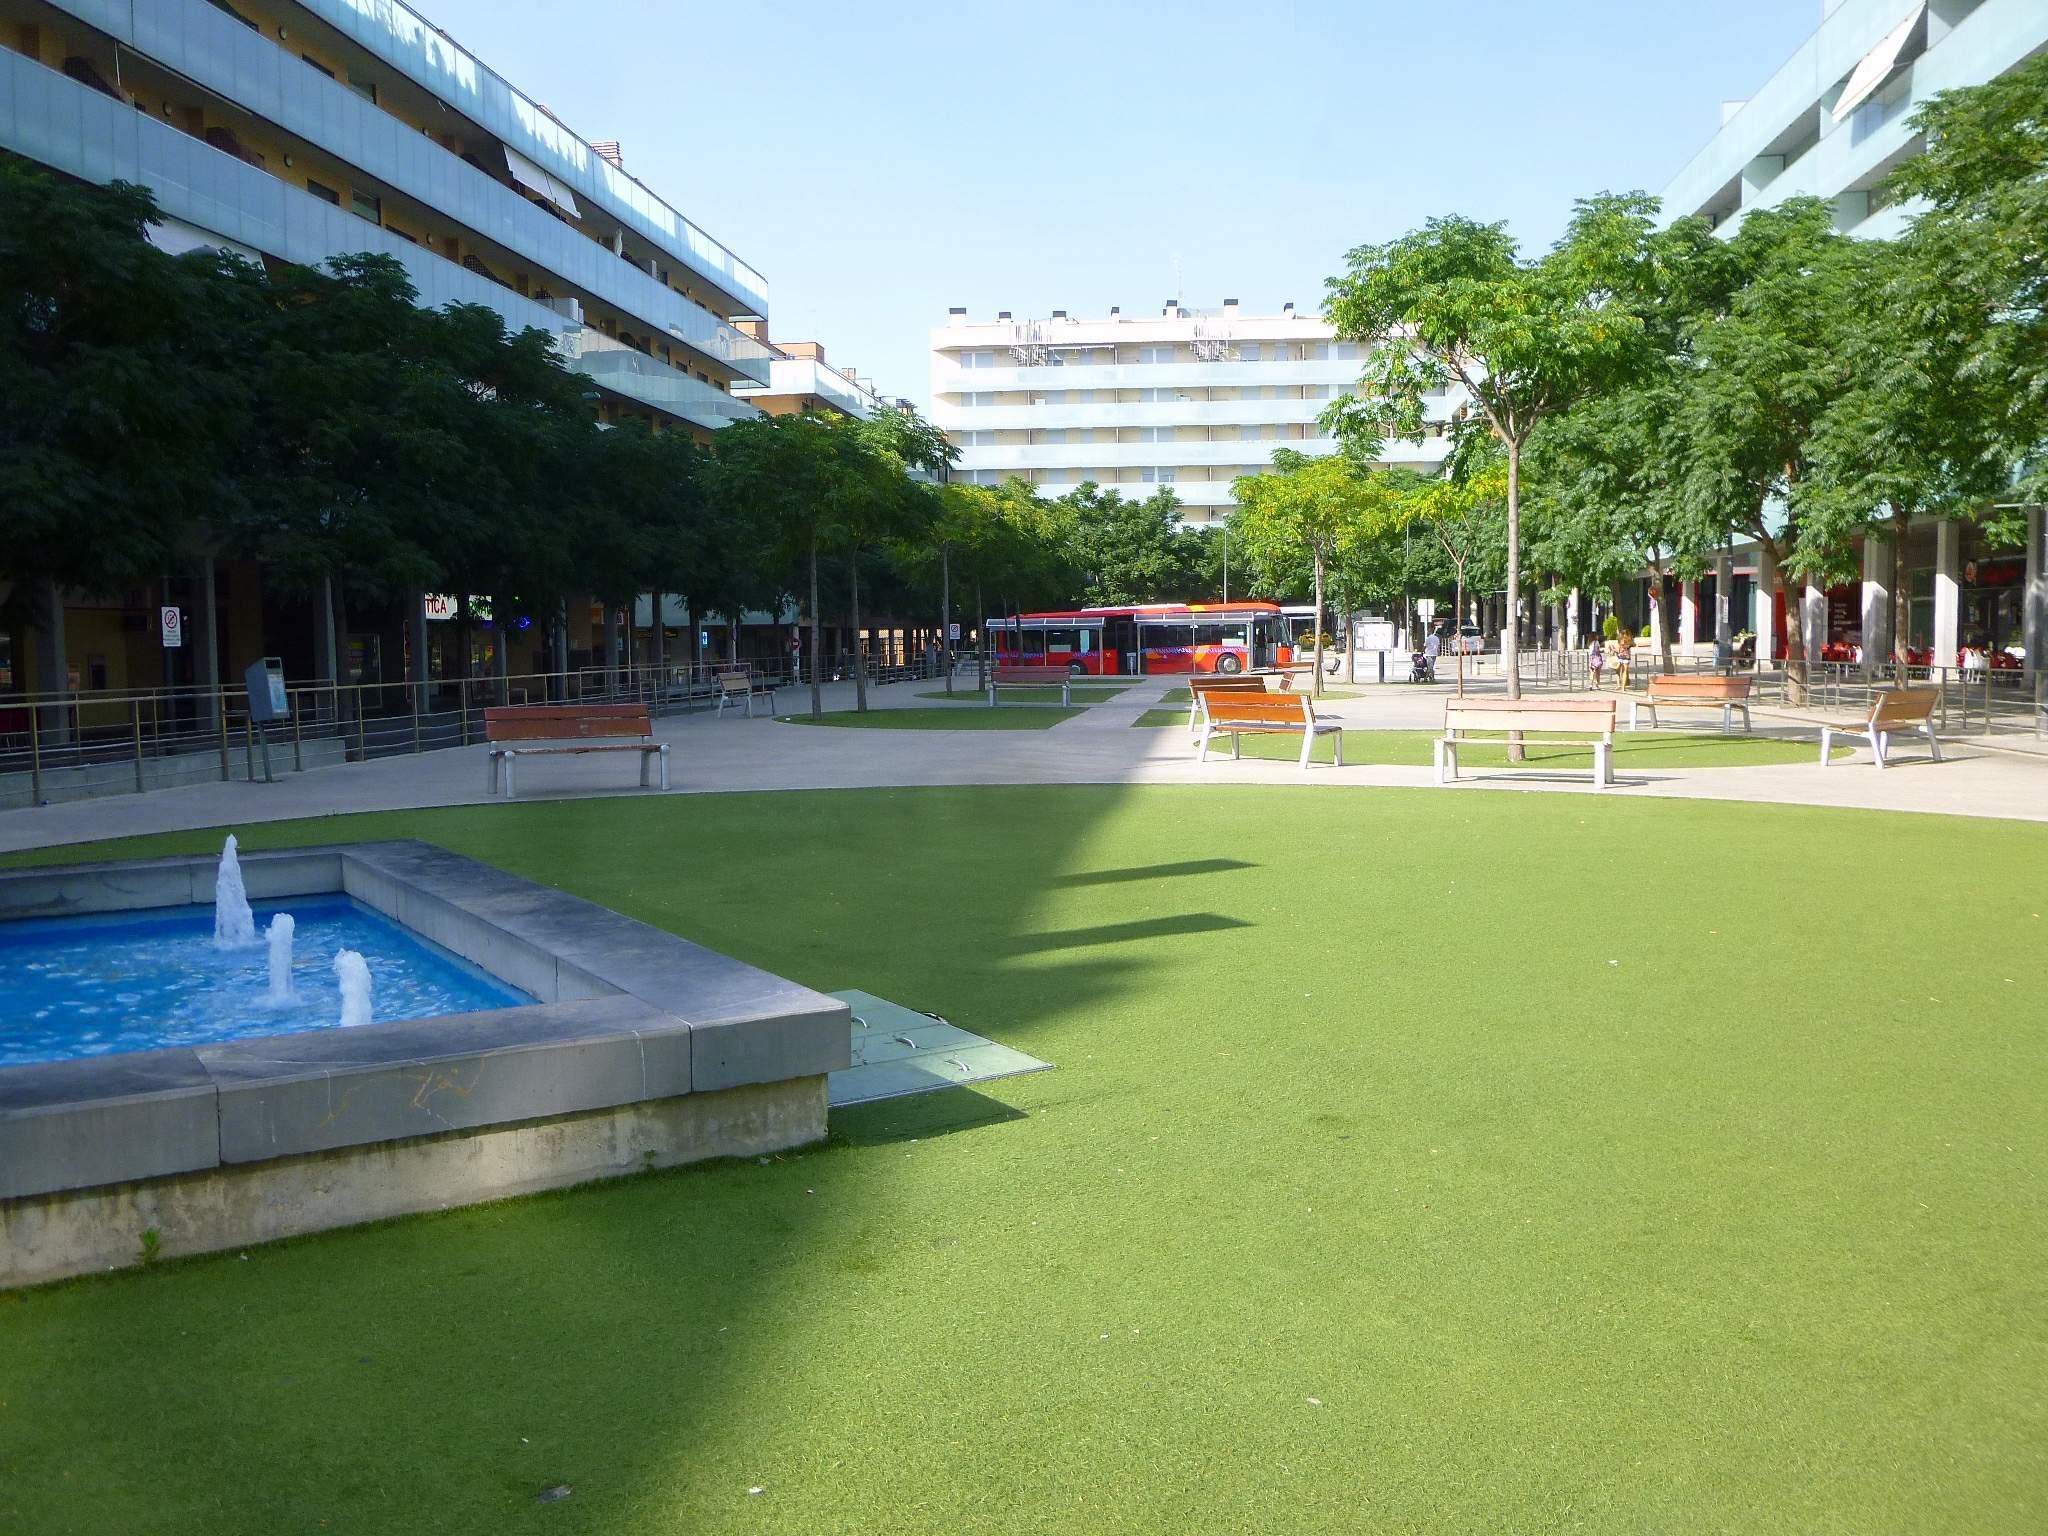 File:Cuarte de Huerva - Residencial Forum Cuarte 5.jpg - Wikimedia ...